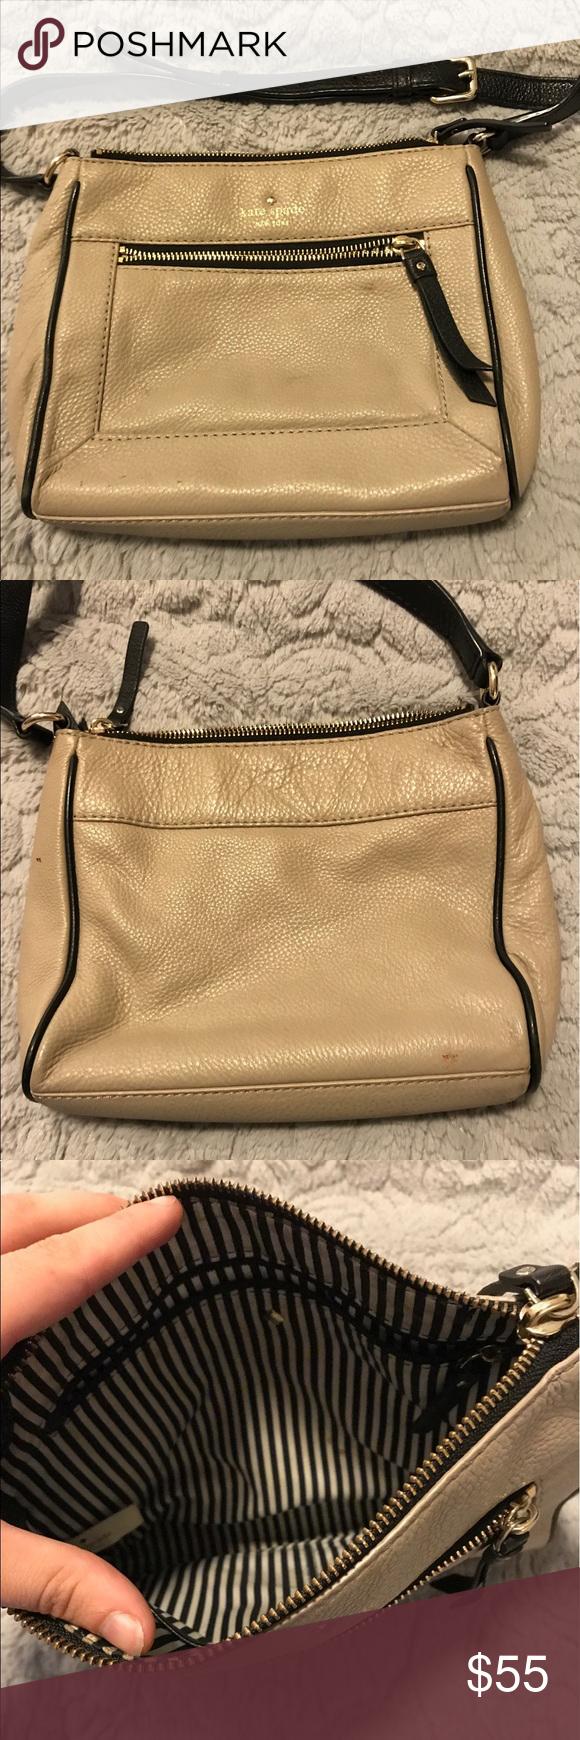 Kate Spade Purse Medium size strap length kate spade Bags Shoulder Bags